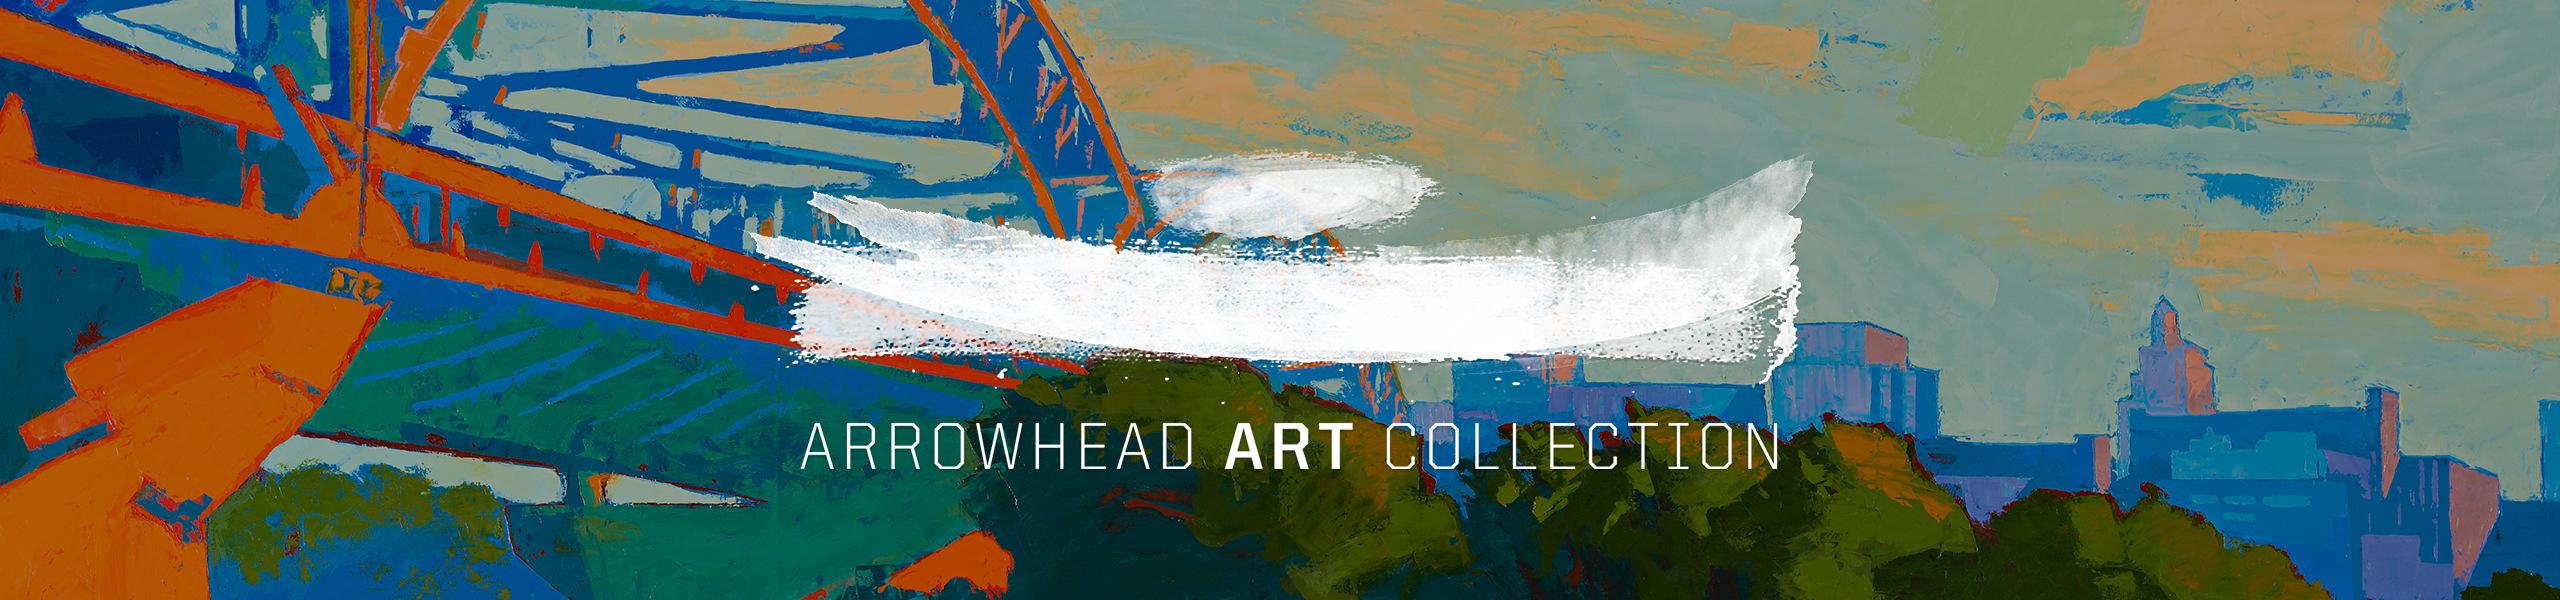 Arrowhead Art Collection   Kansas City Chiefs - Chiefs com